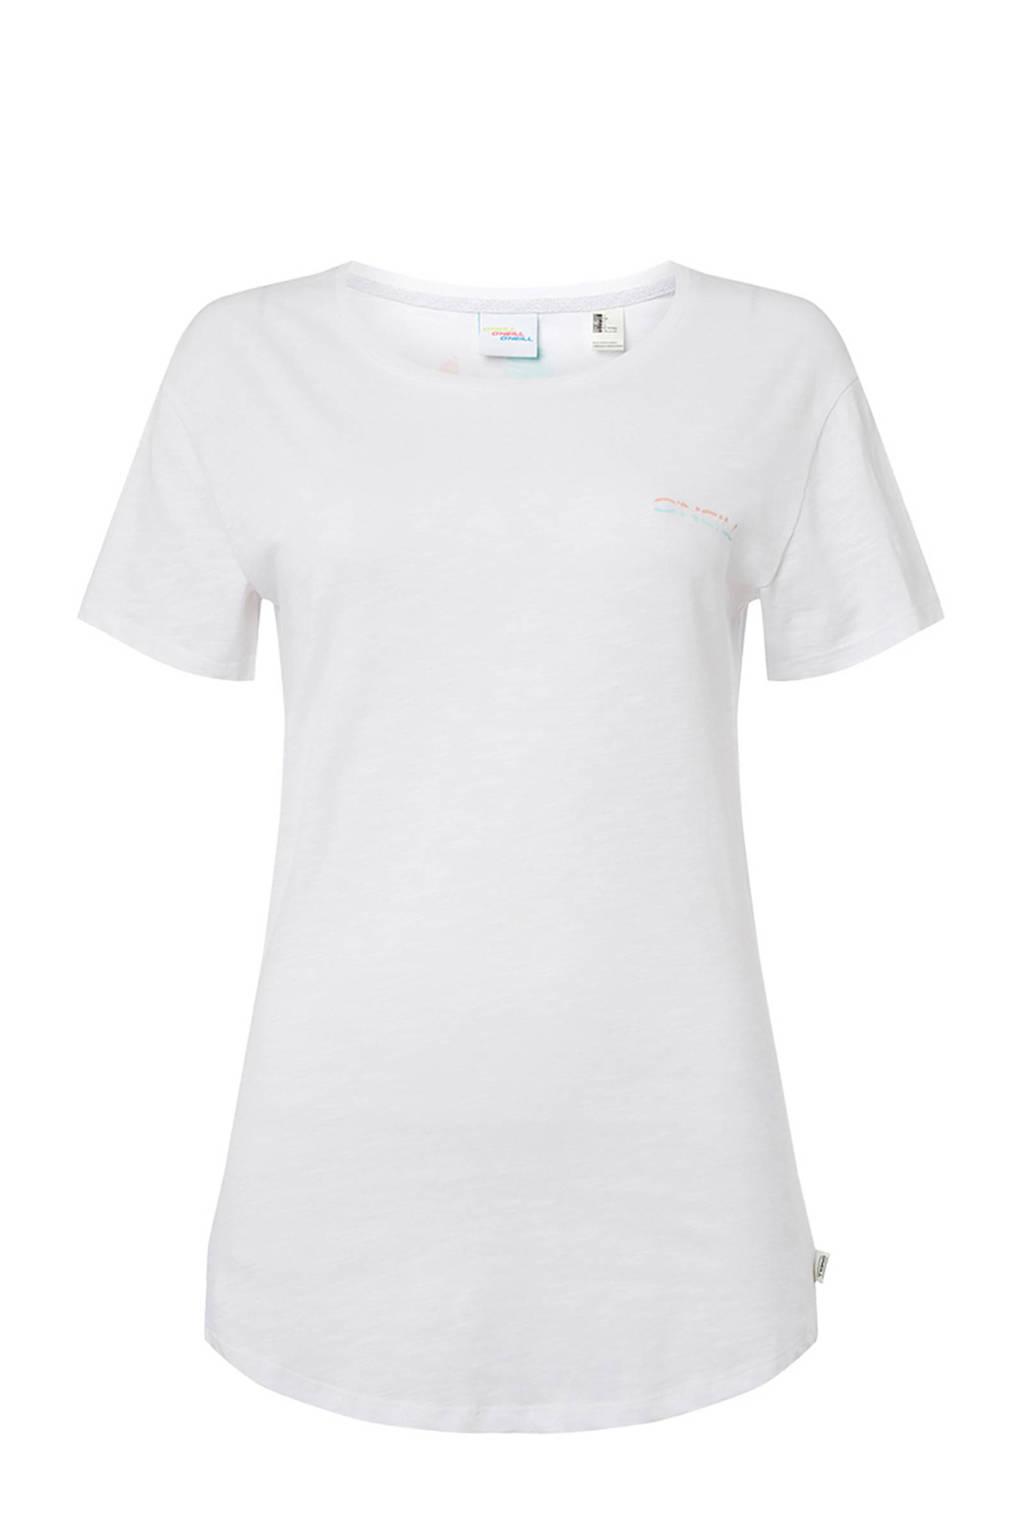 O'Neill T-shirt met printopdruk wit, Wit